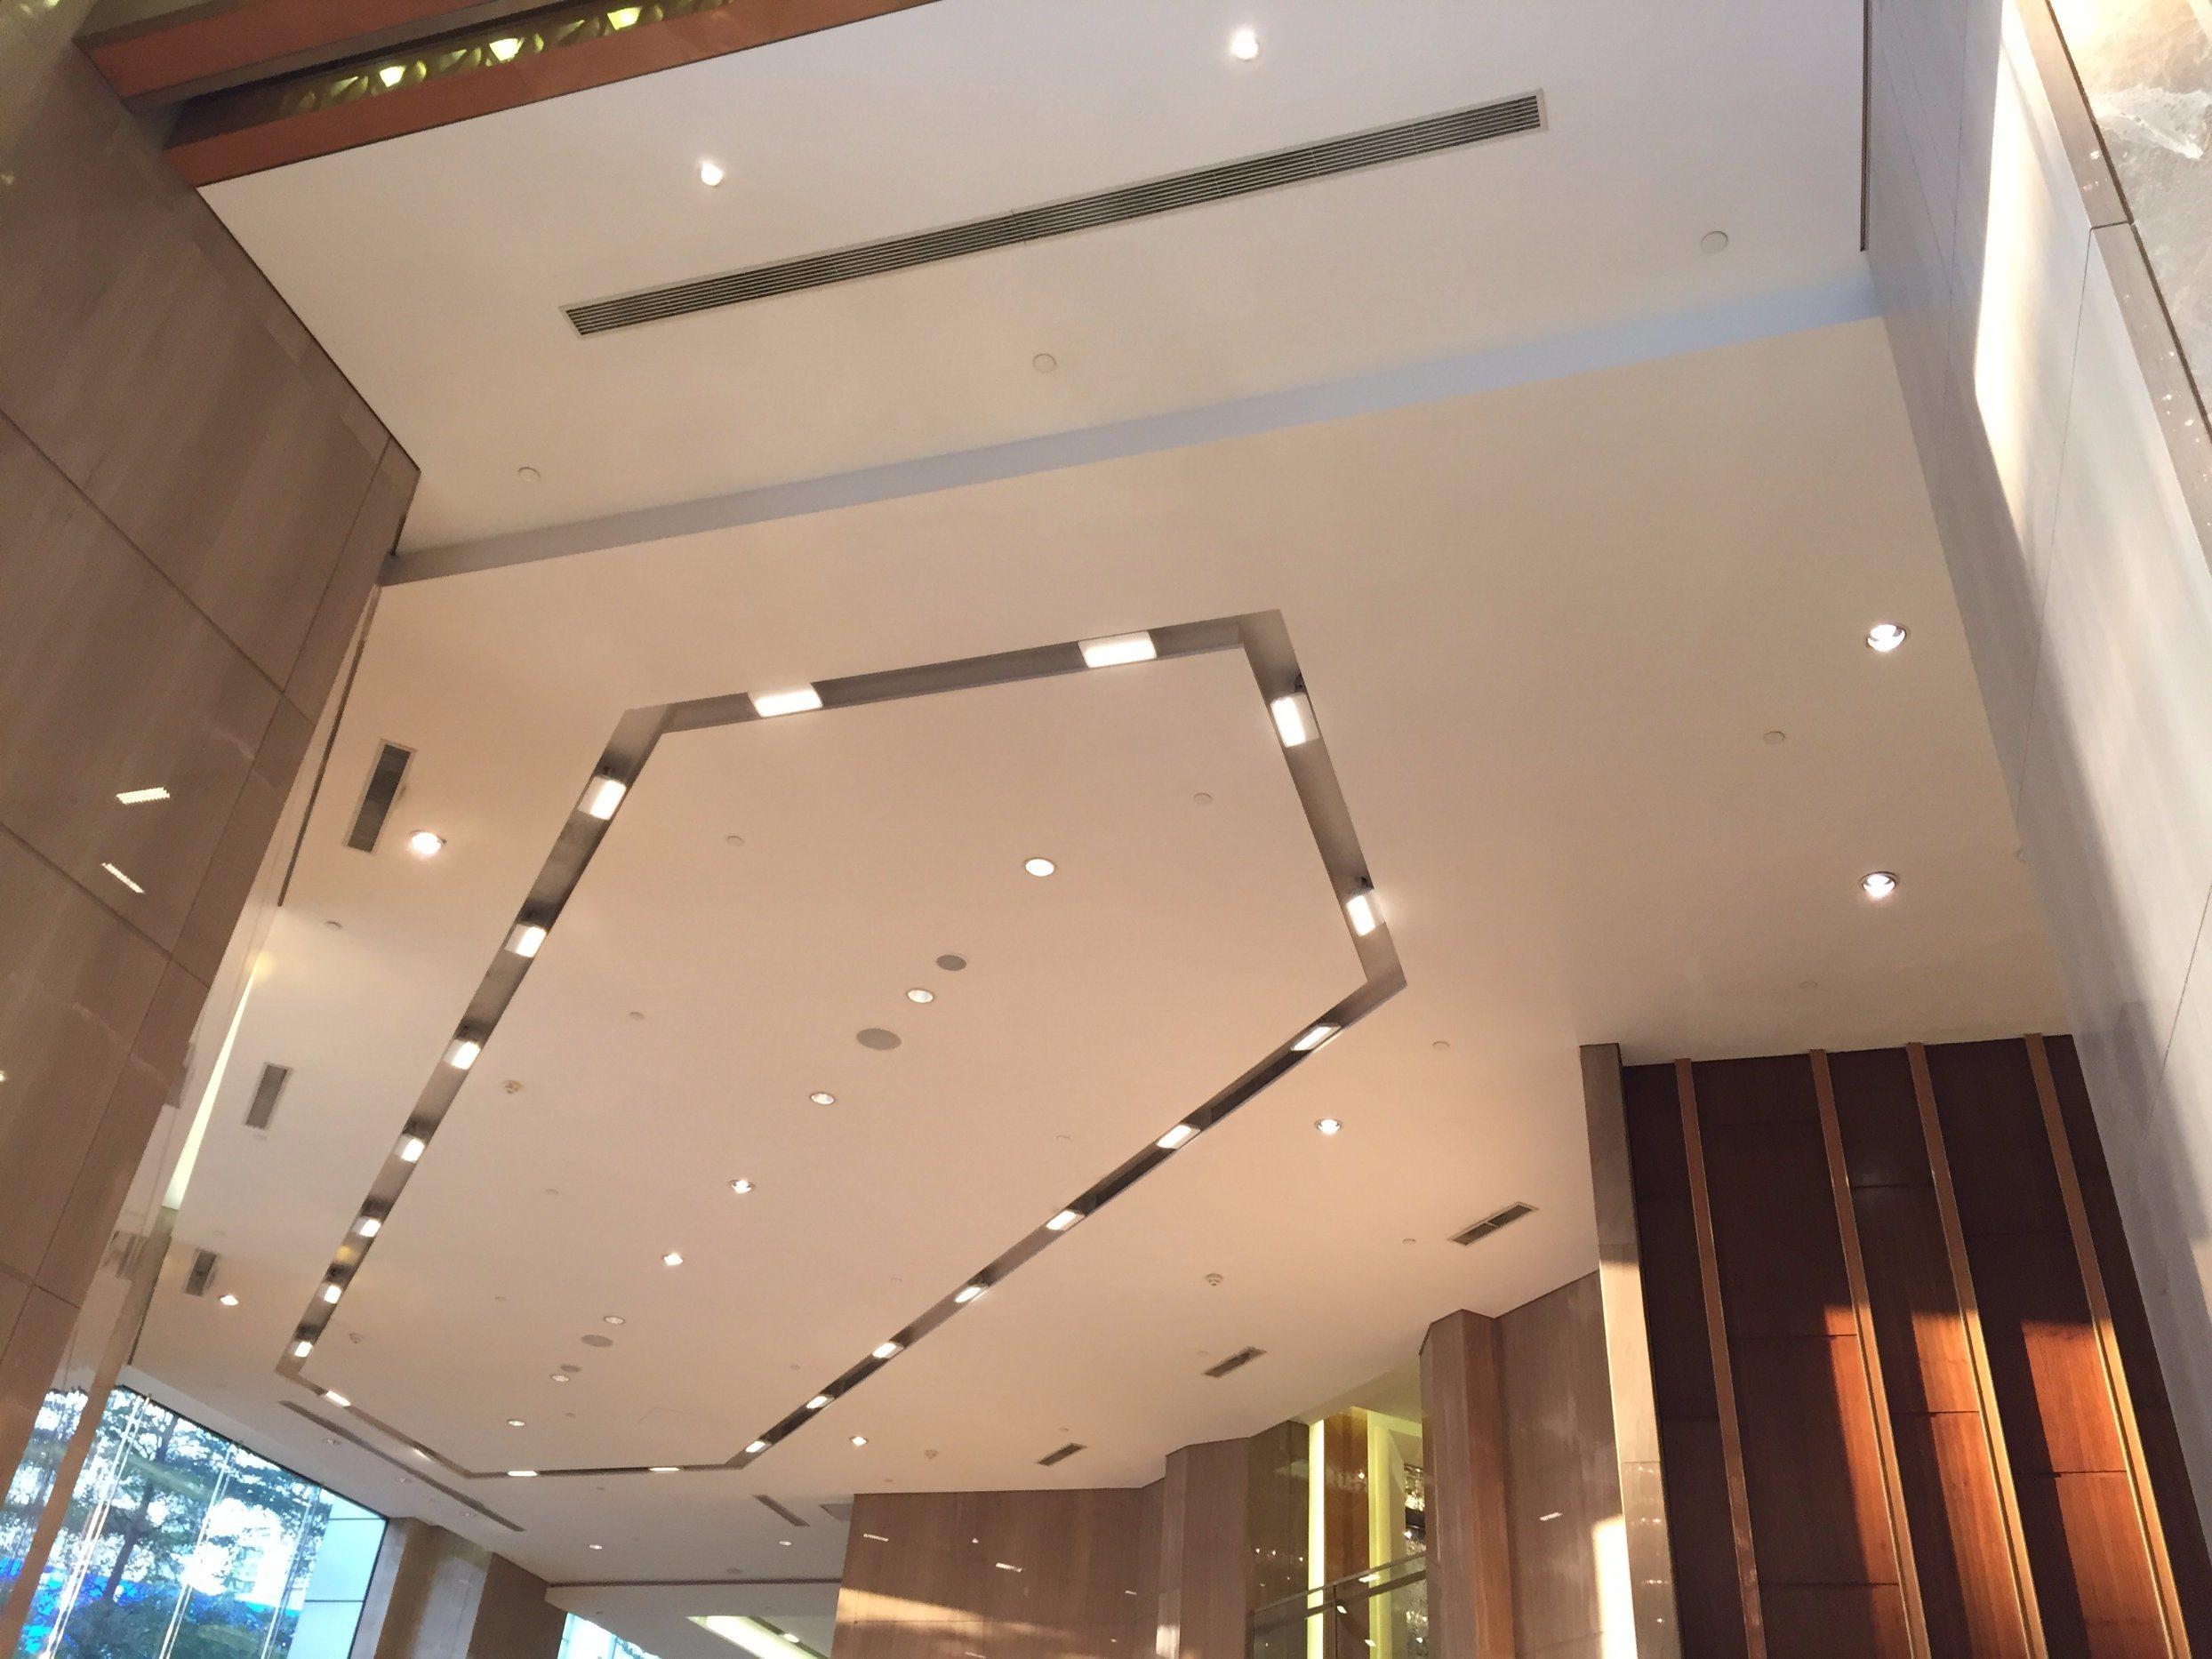 Holyoake Ceiling Slot Diffusers | Taraba Home Review